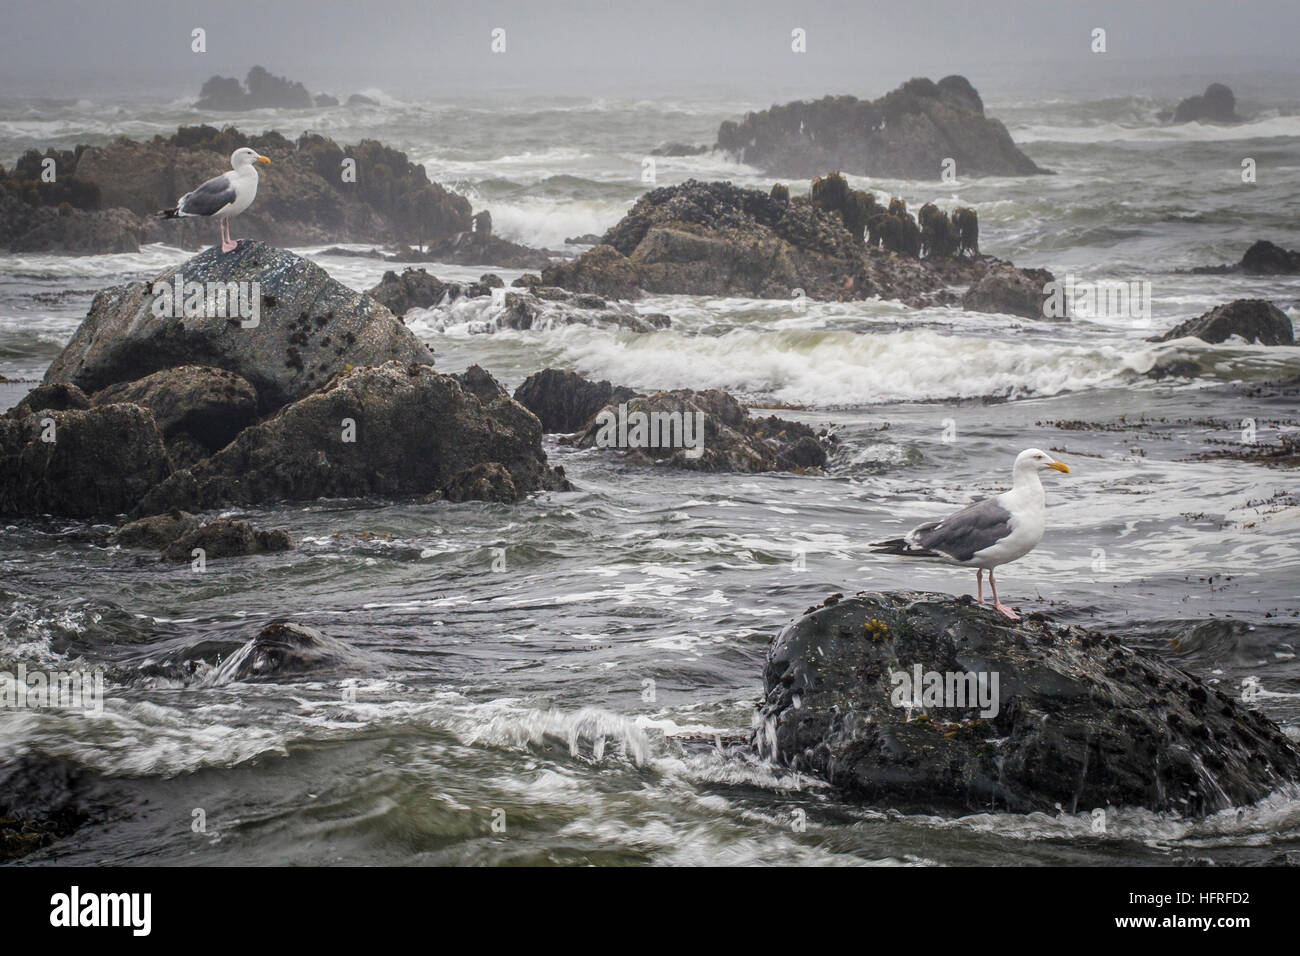 Sea gulls on rocks among rough waves. Oregon coast. - Stock Image